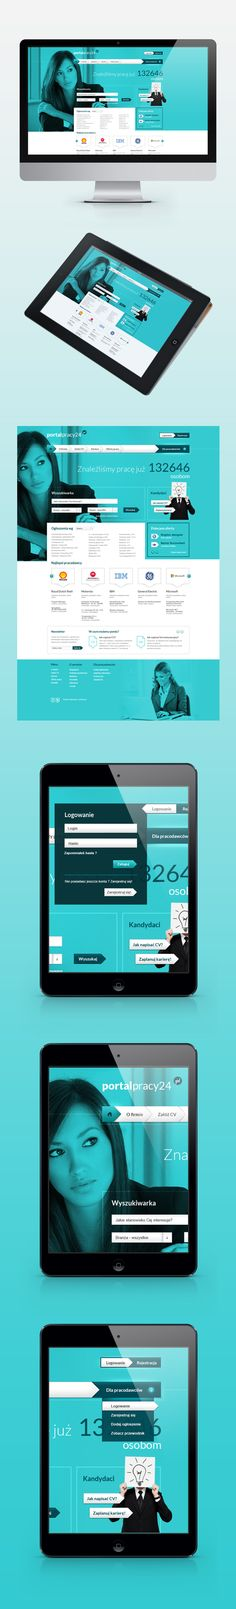 Portalpracy24.pl - Job Portal by Adam Rozmus, via Behance